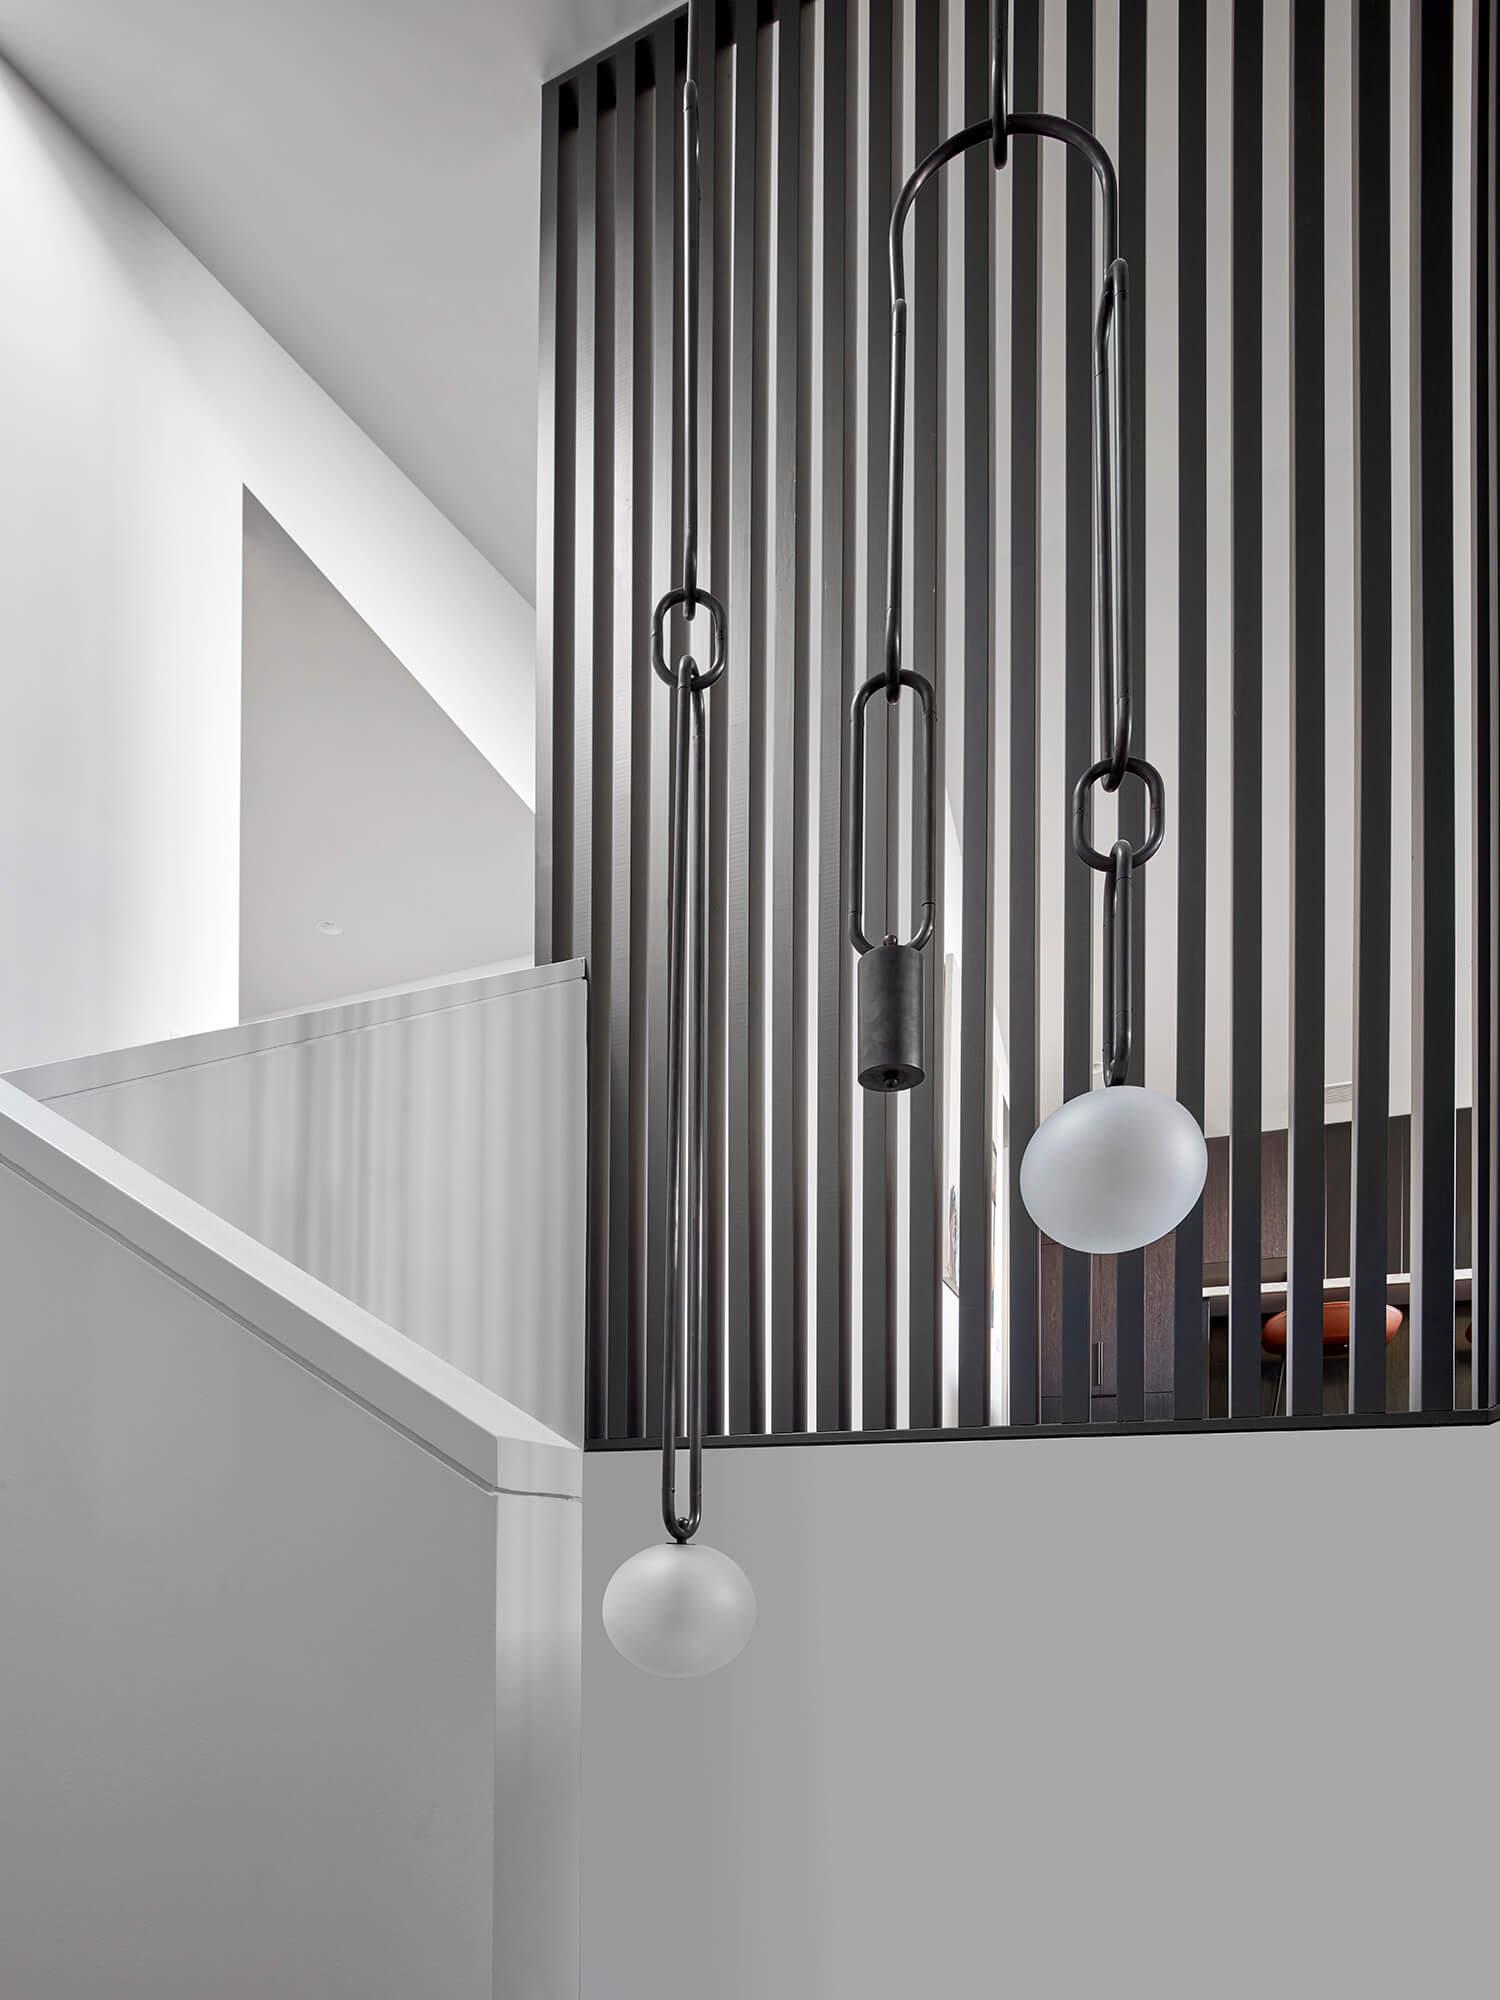 est living interiors Ceres Gable House Tecture 16